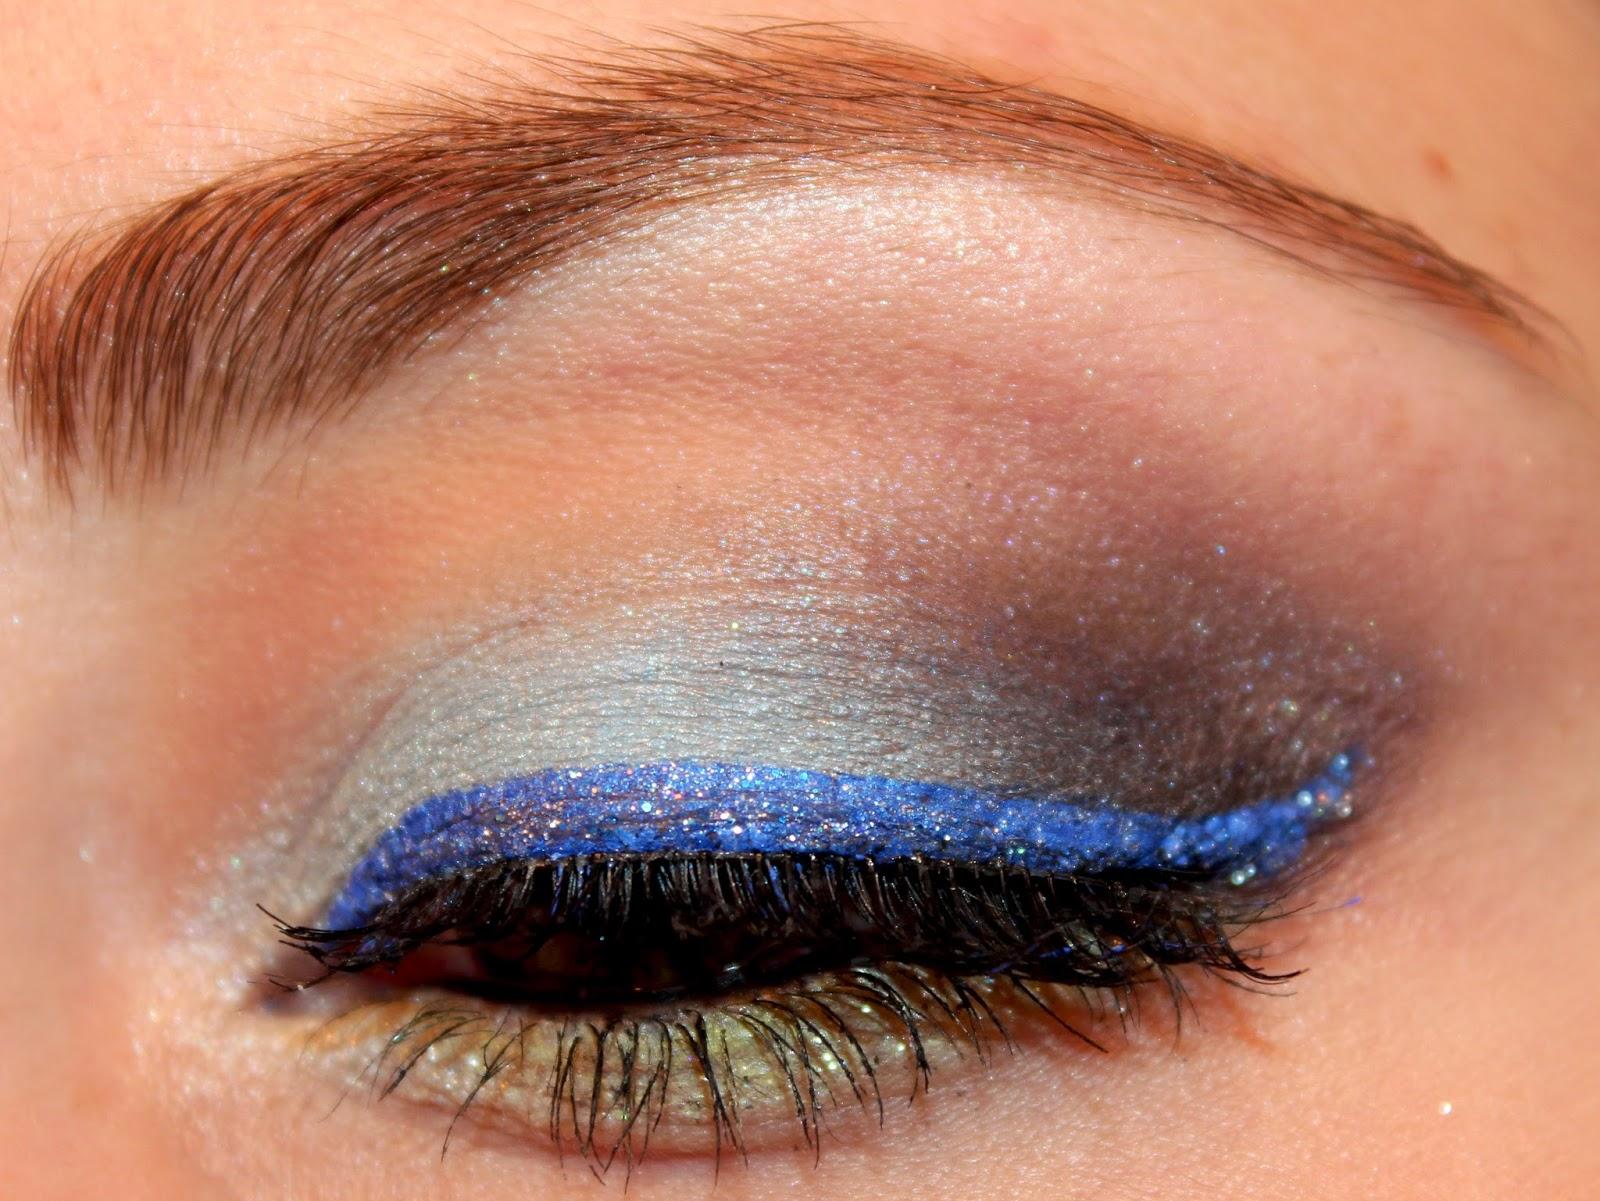 Luhivys Favorite Things Disney Series Cinderella Inspired Makeup